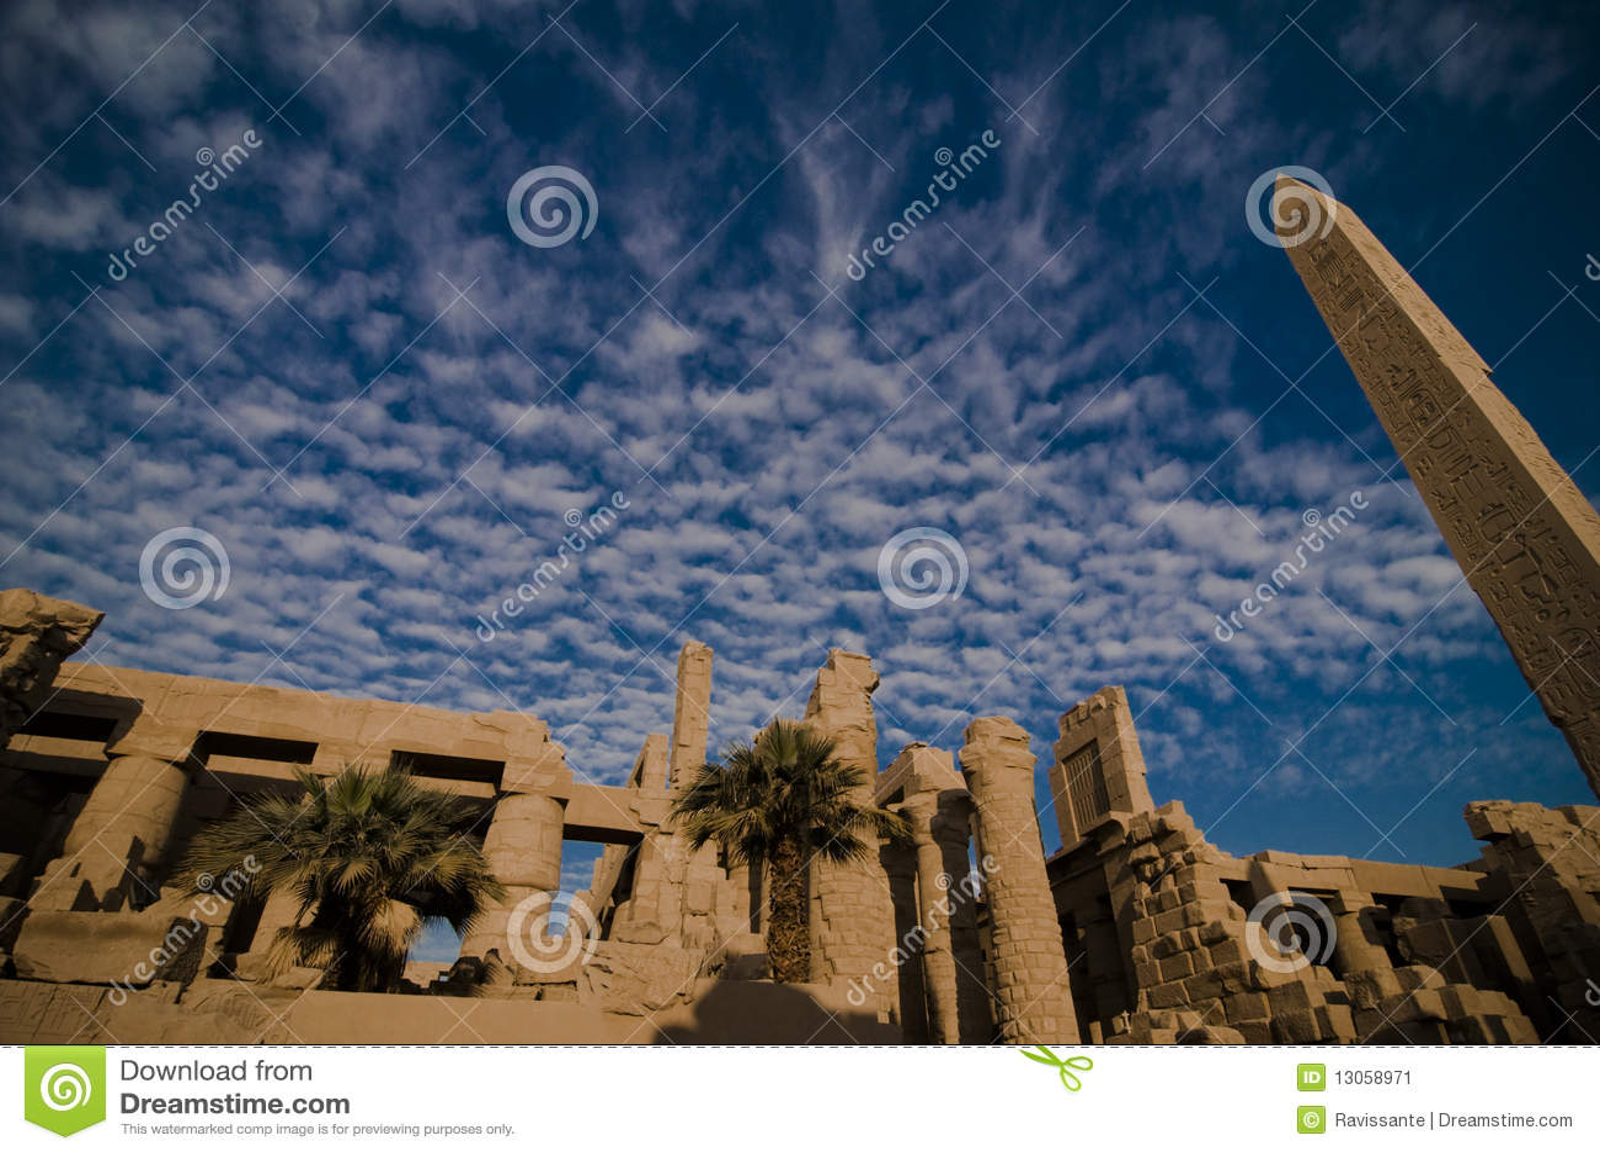 Temple of Amun, Karnak Temple, Egypt.